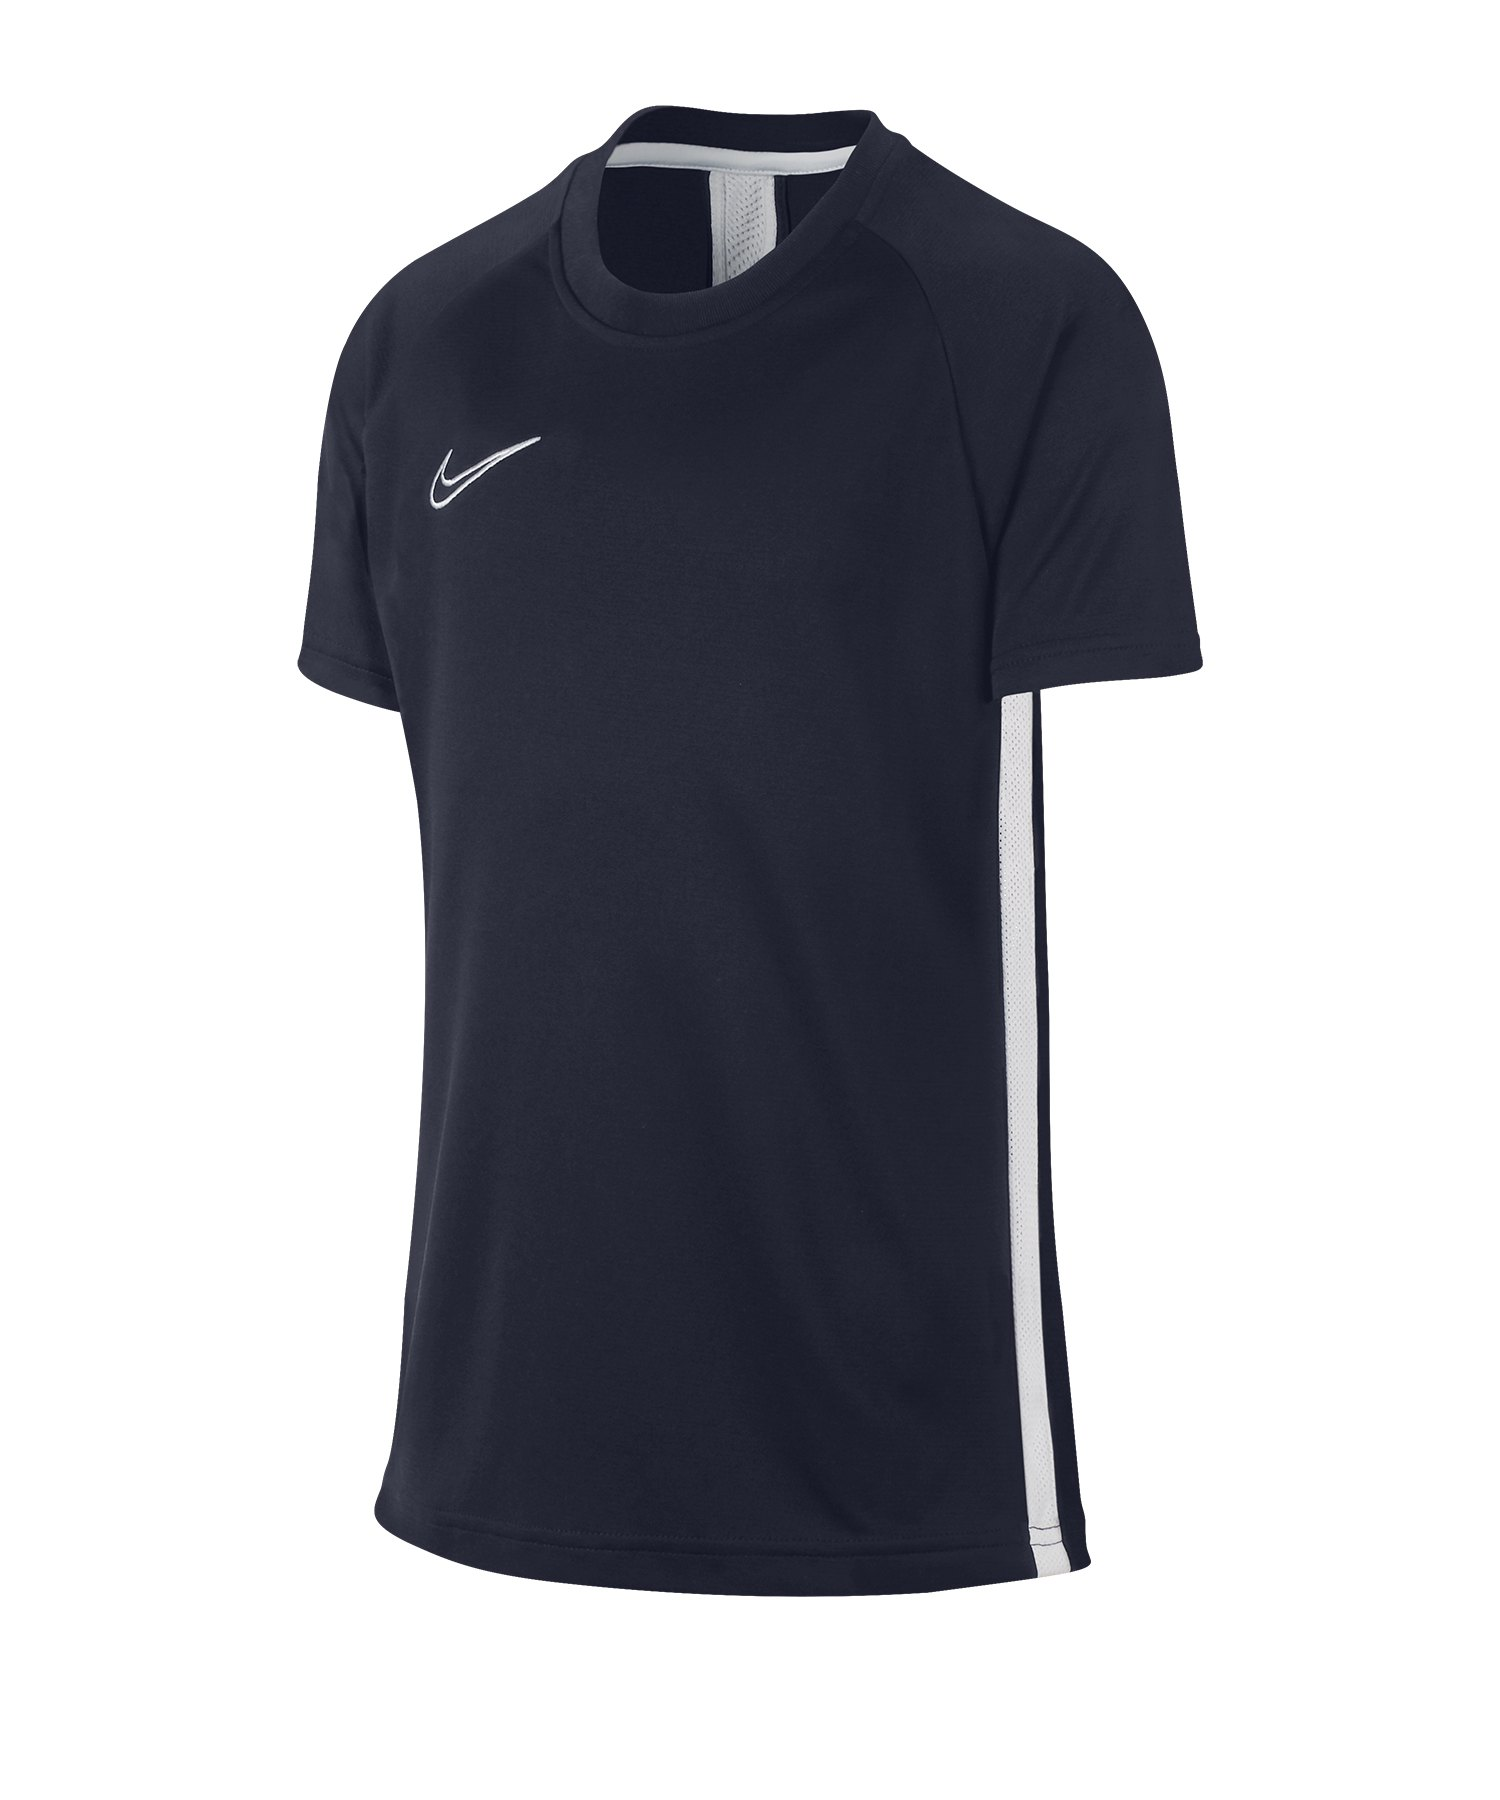 Nike Academy Dri-FIT Top T-Shirt Kids Blau F451 - Blau